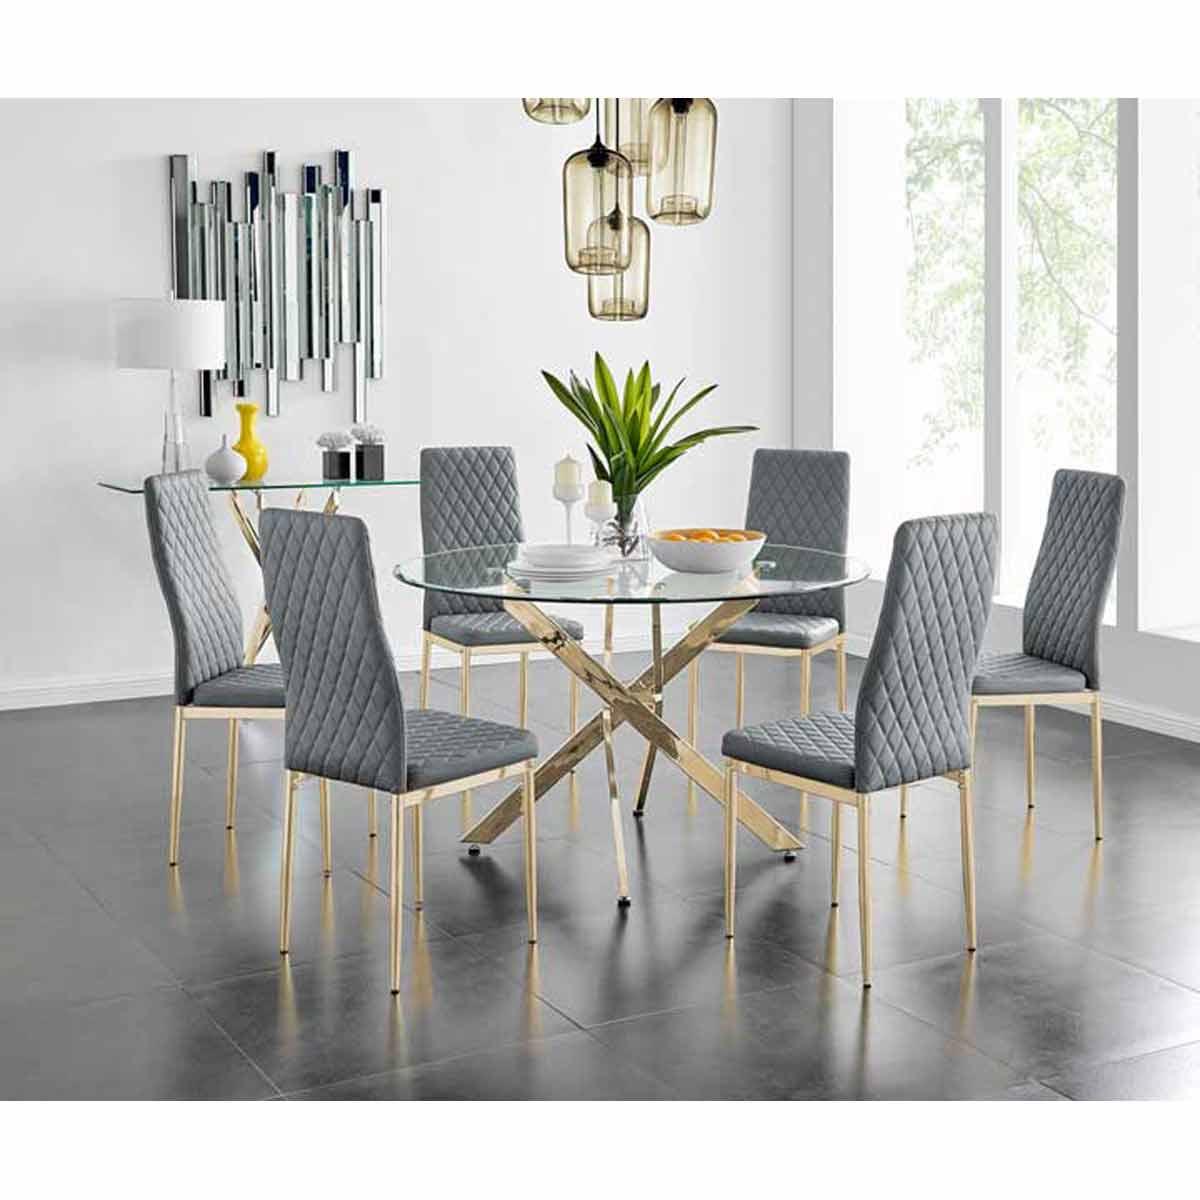 Furniture Box Novara 120cm Gold Round Dining Table and 6 Grey Gold Leg Milan Chairs